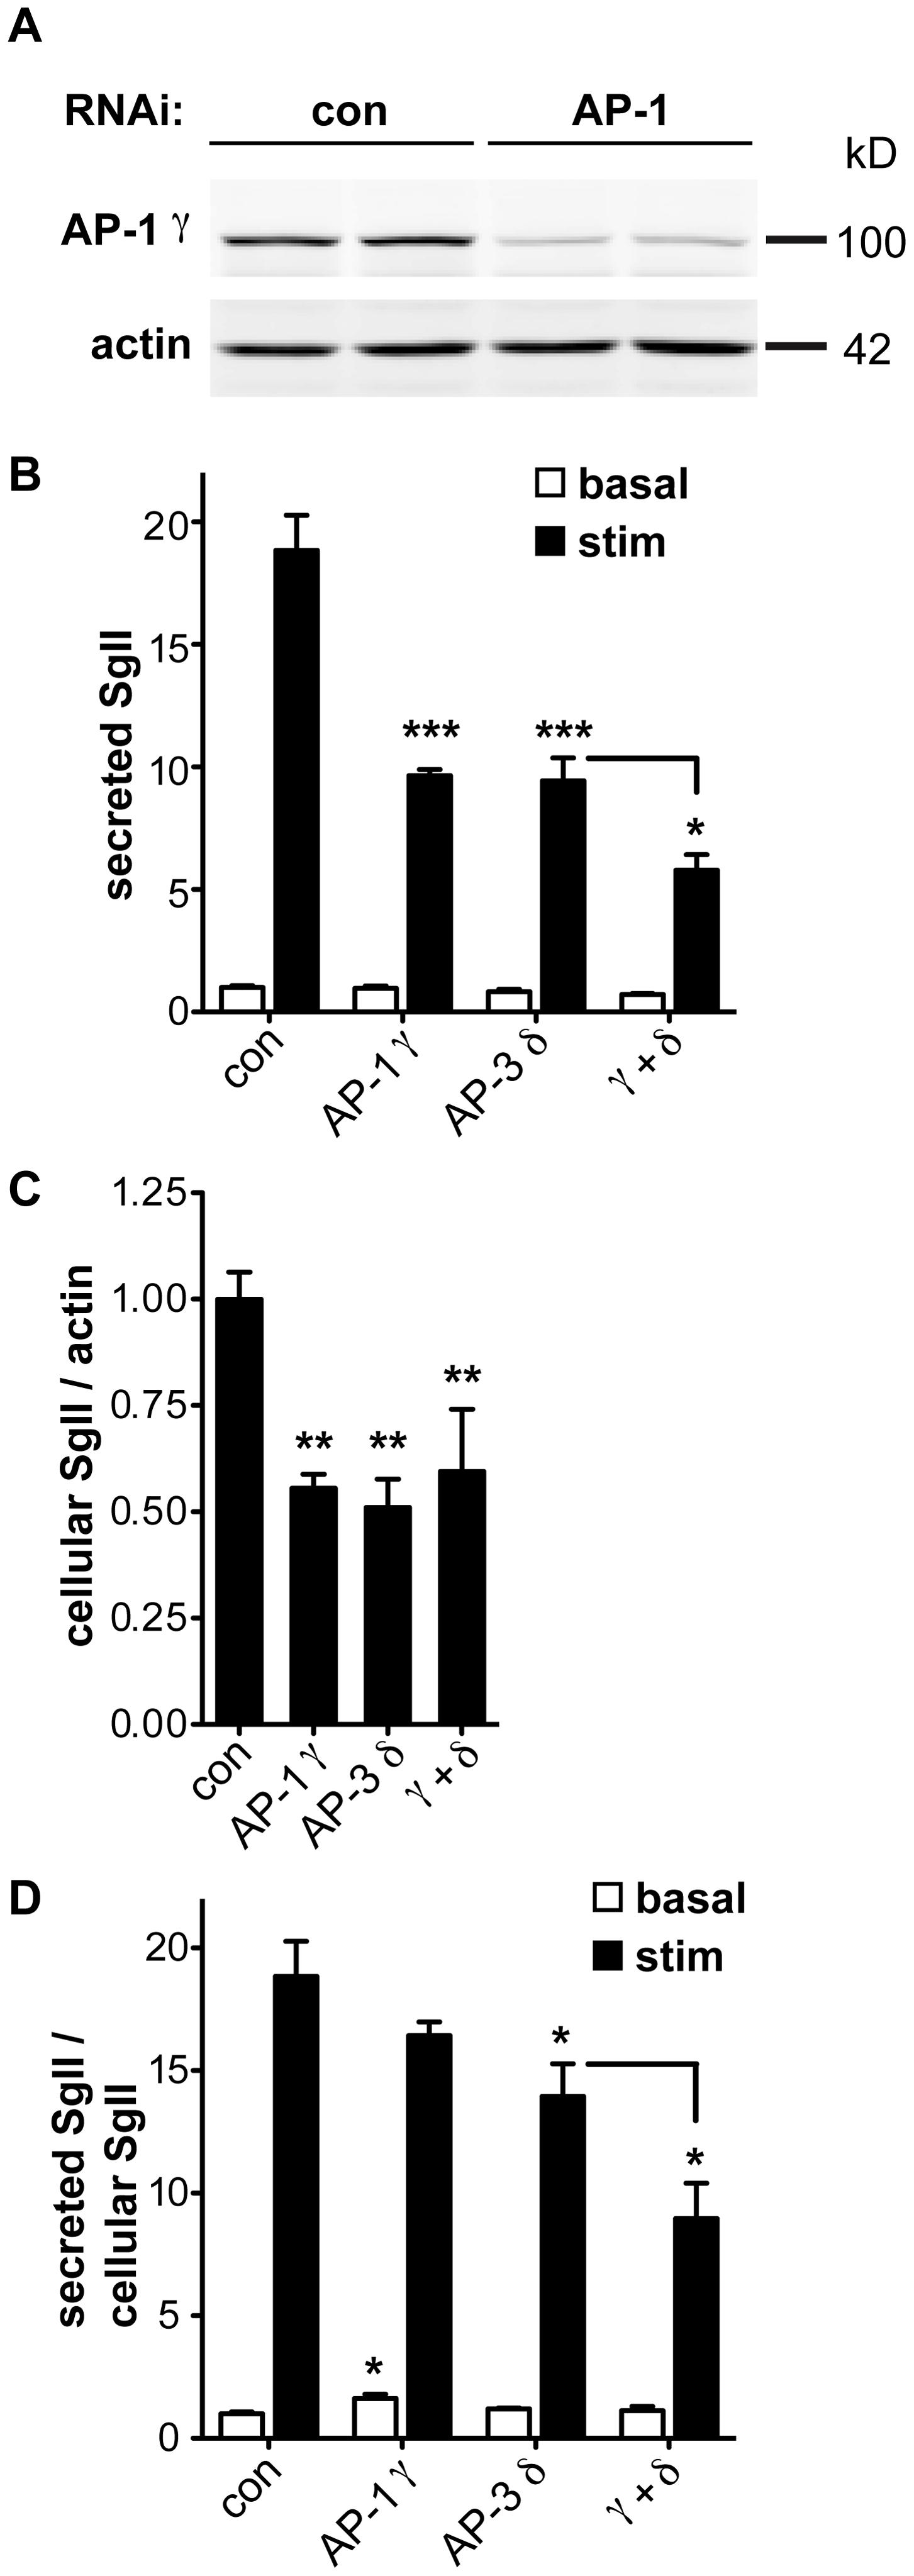 AP-1 knockdown potentiates the effect of AP-3 knockdown on regulated secretion.